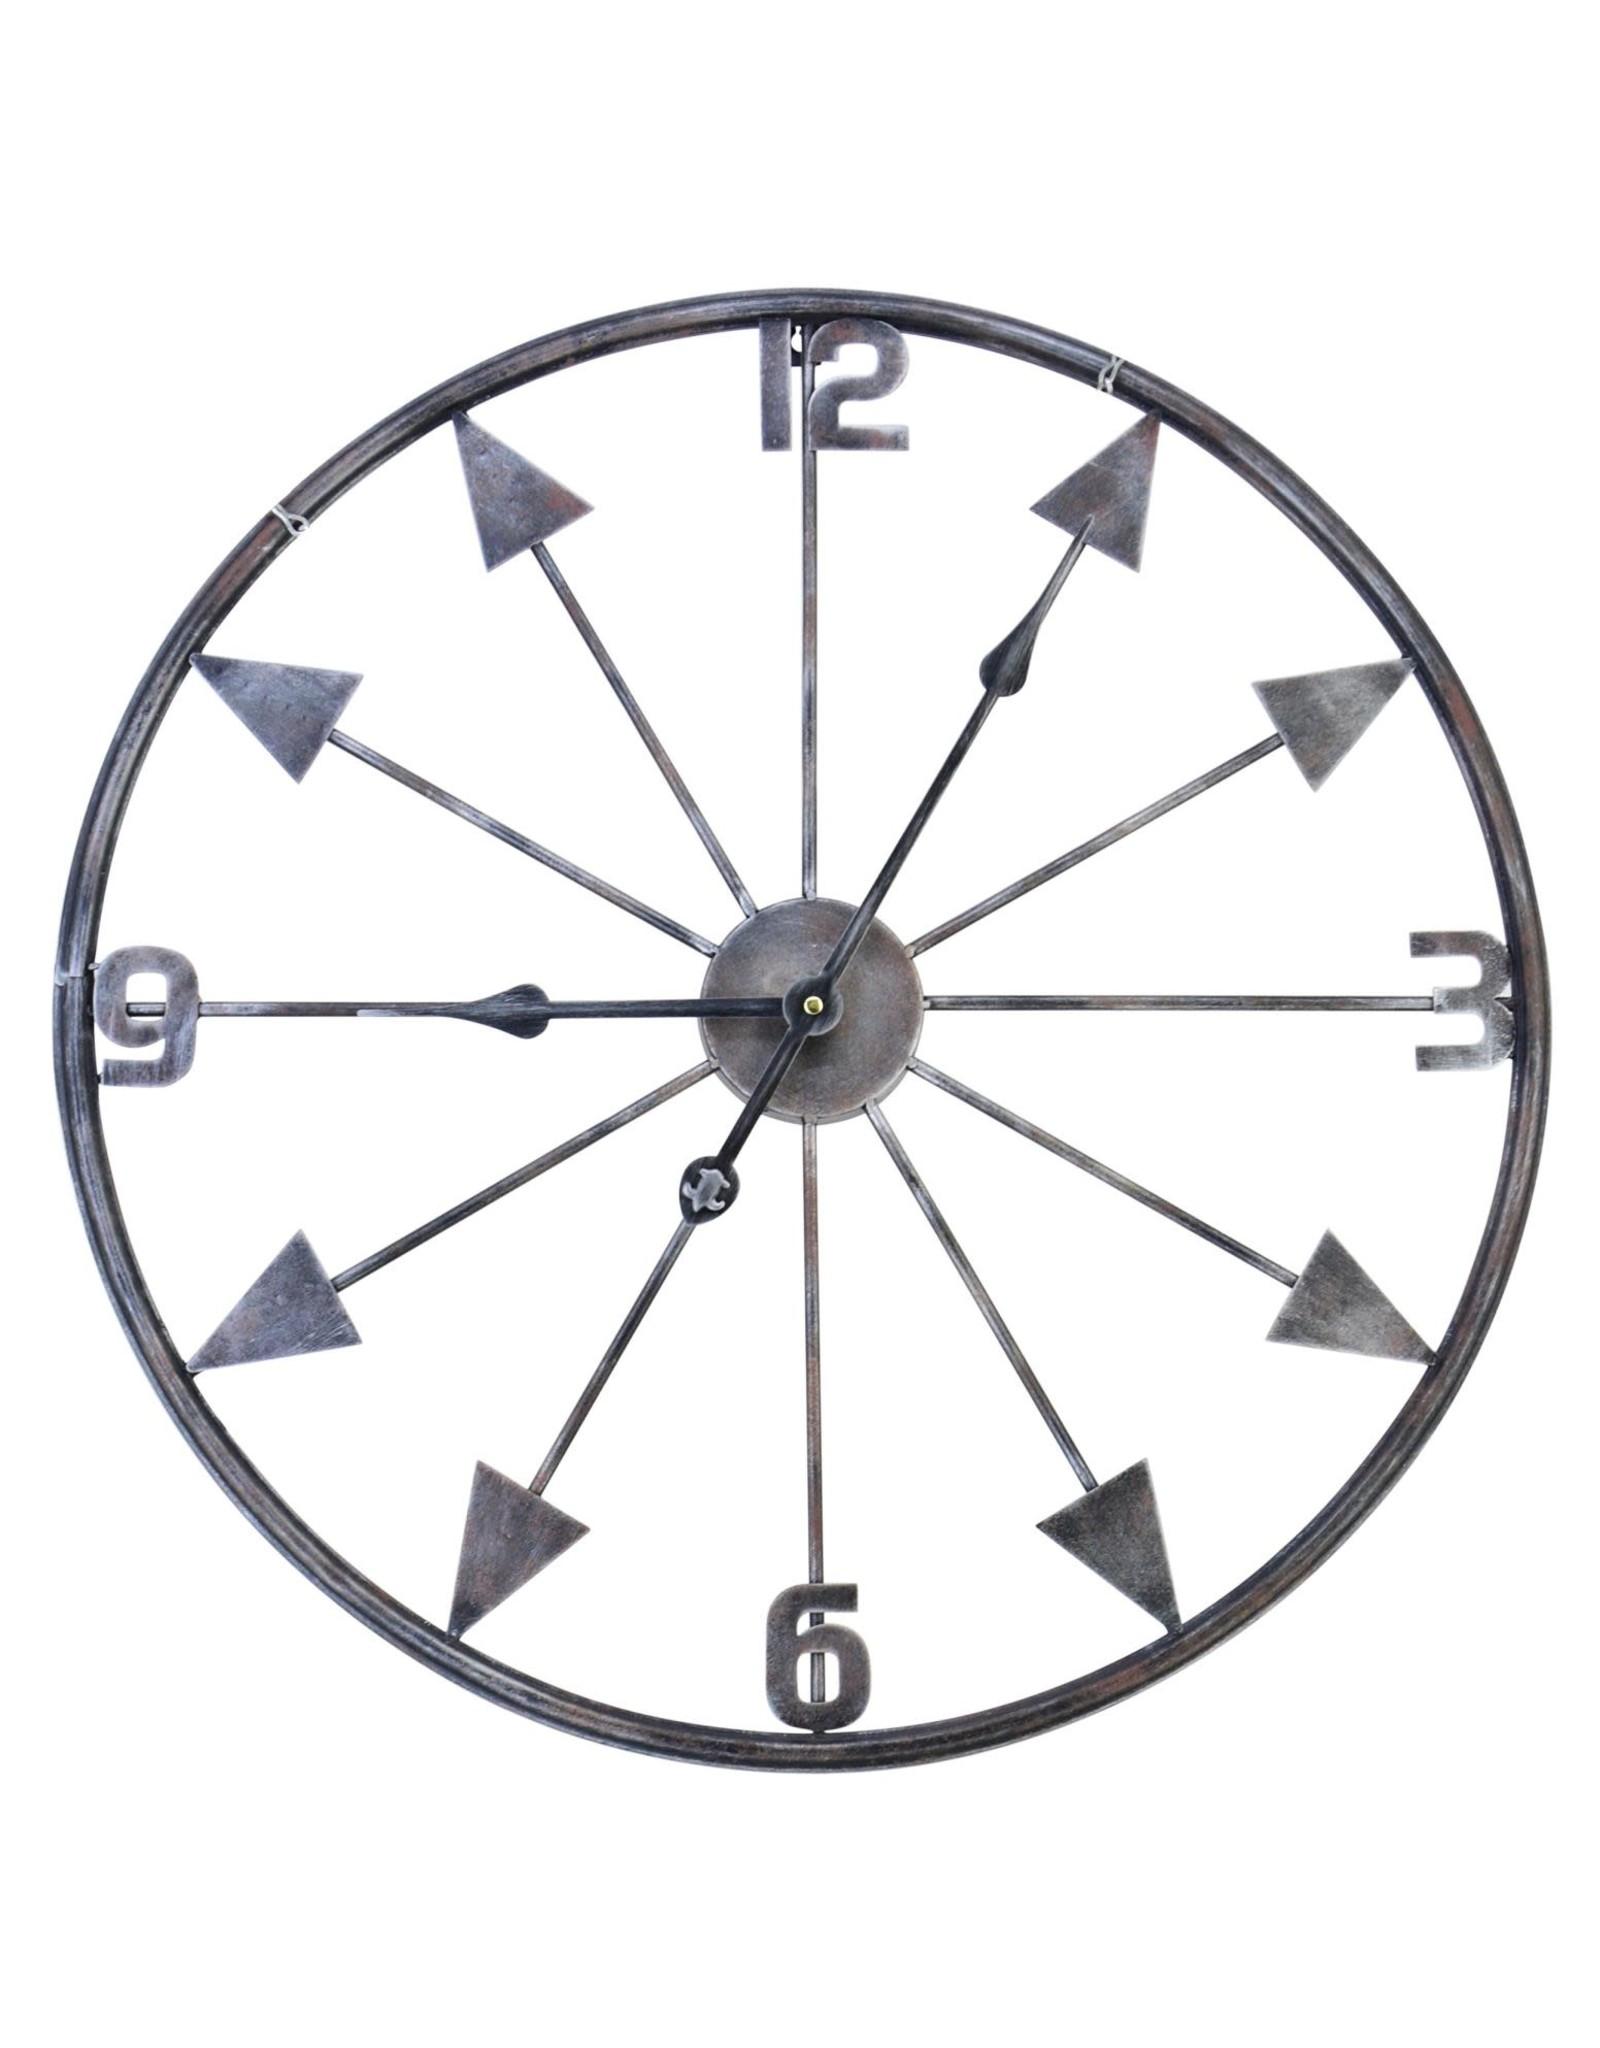 HB1299 Metal Wall Clock